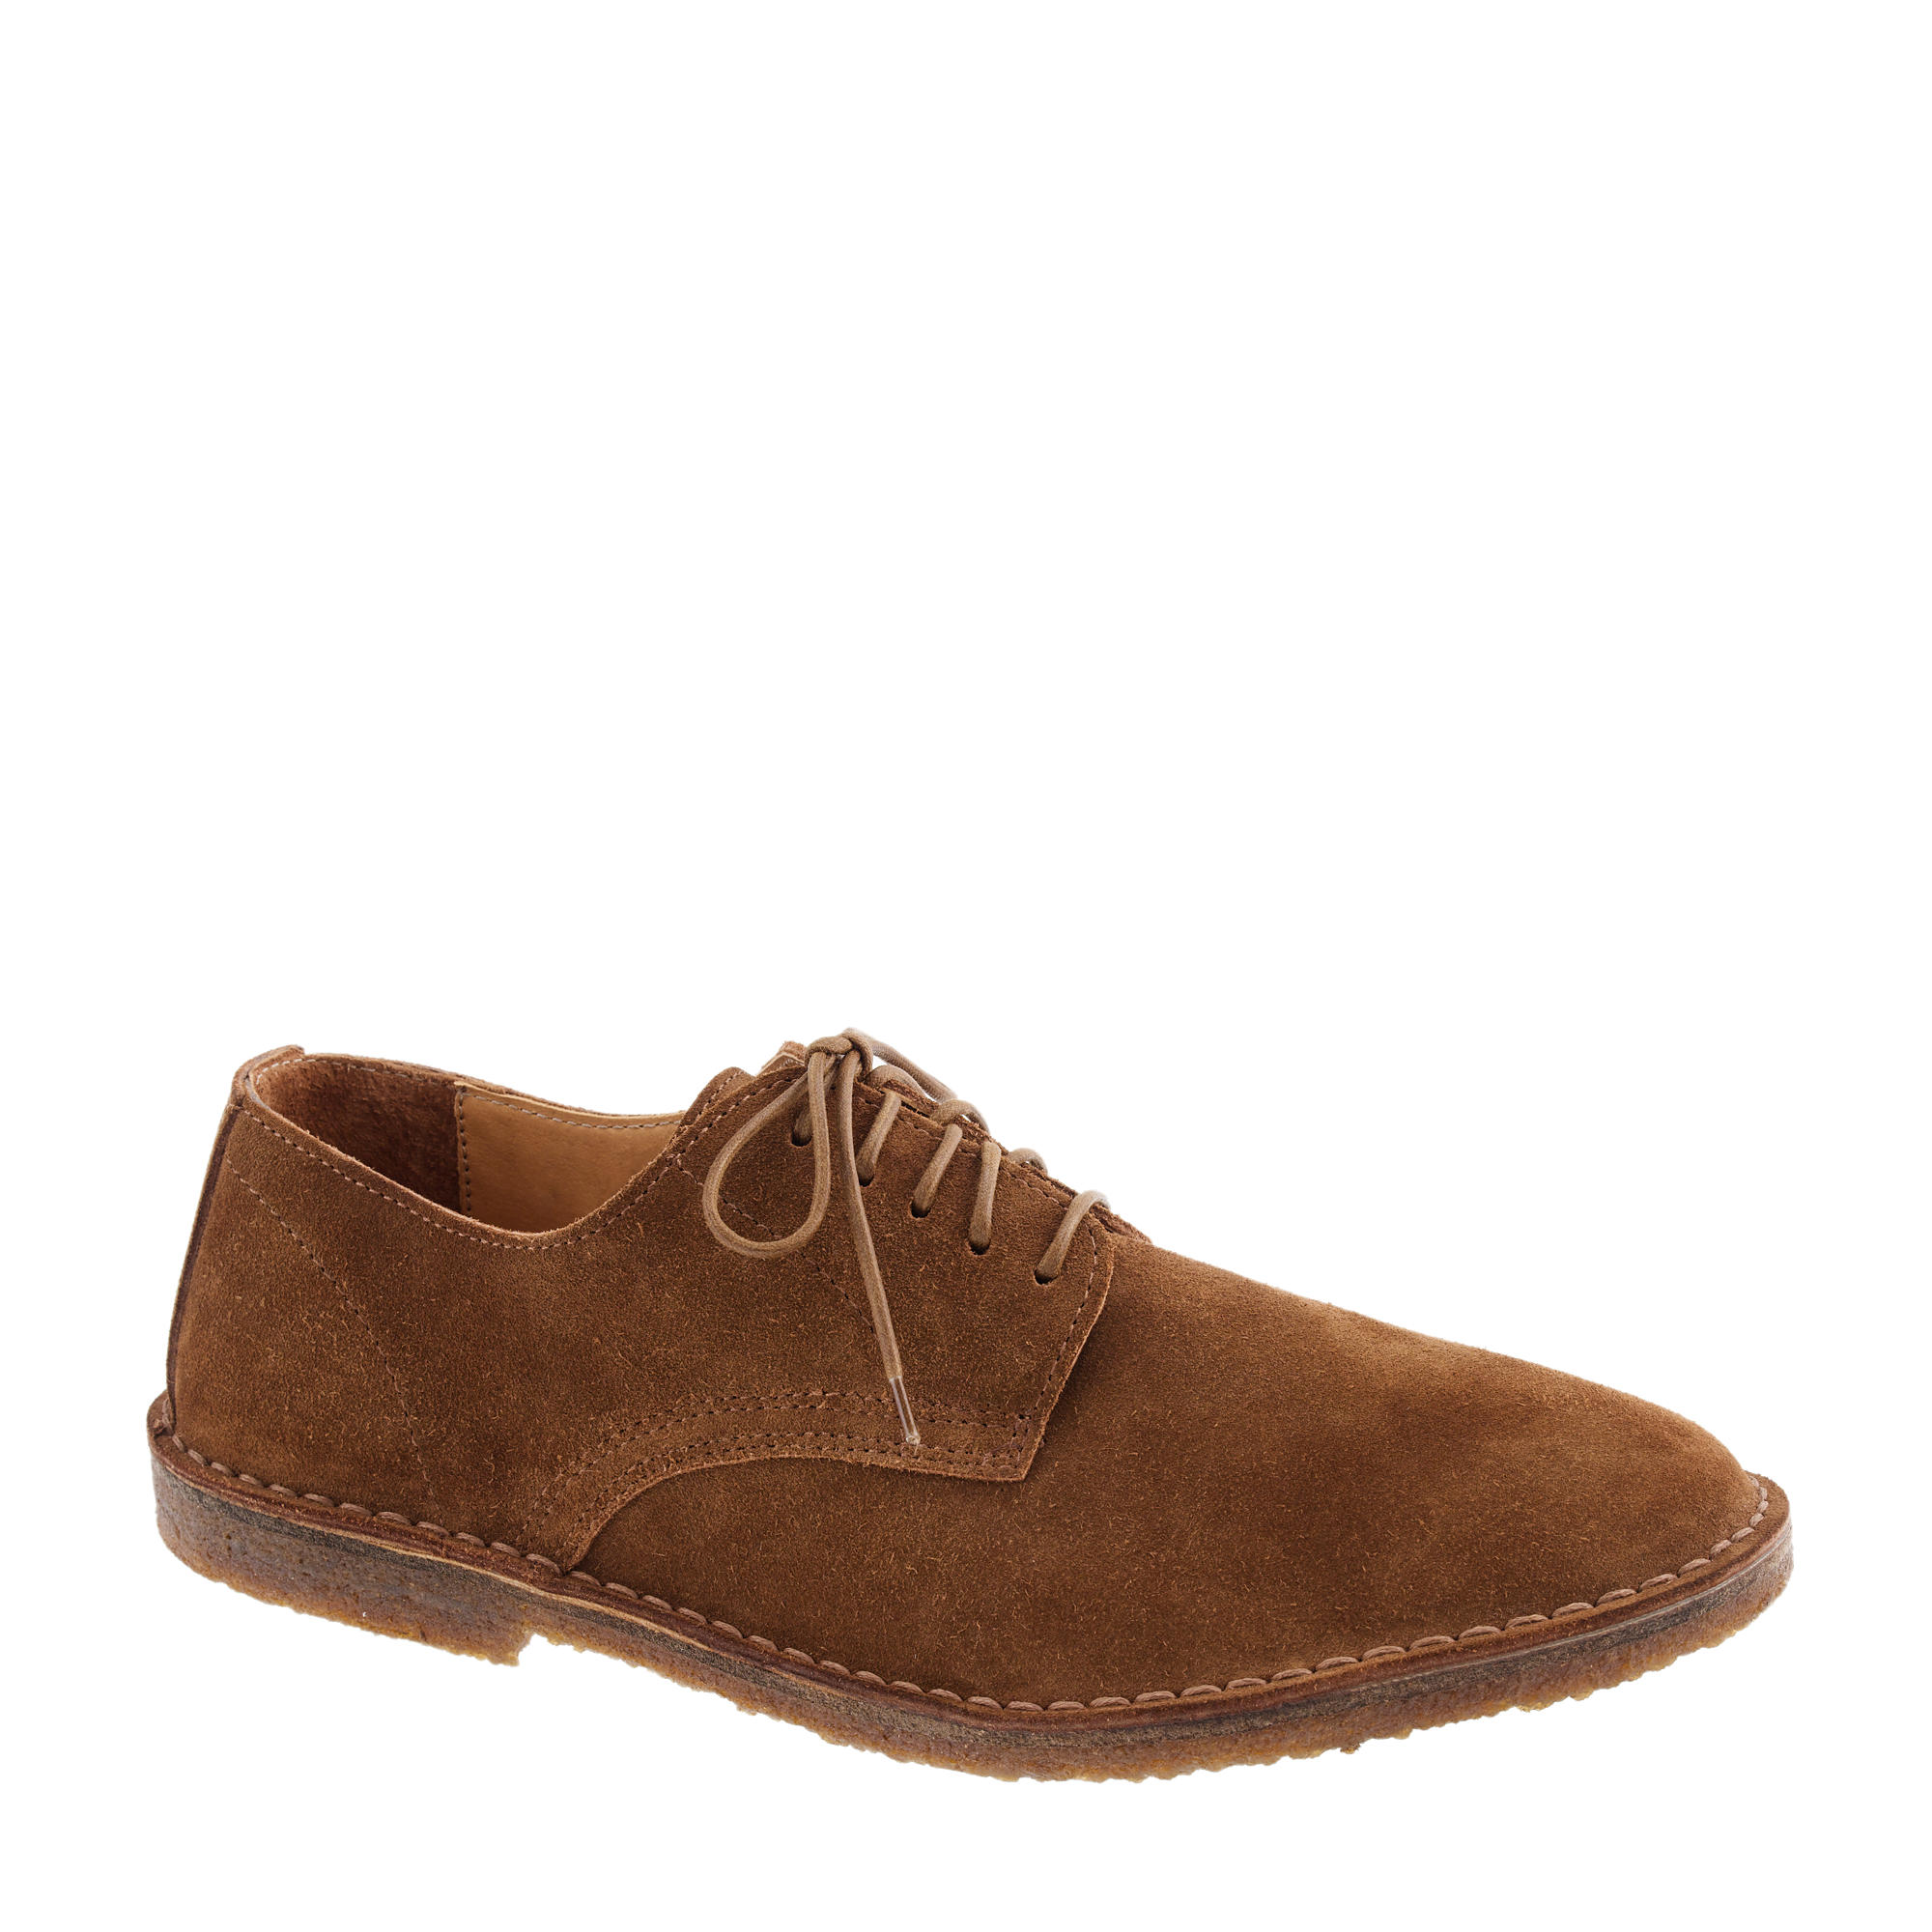 J Crew Factory Mens Shoes